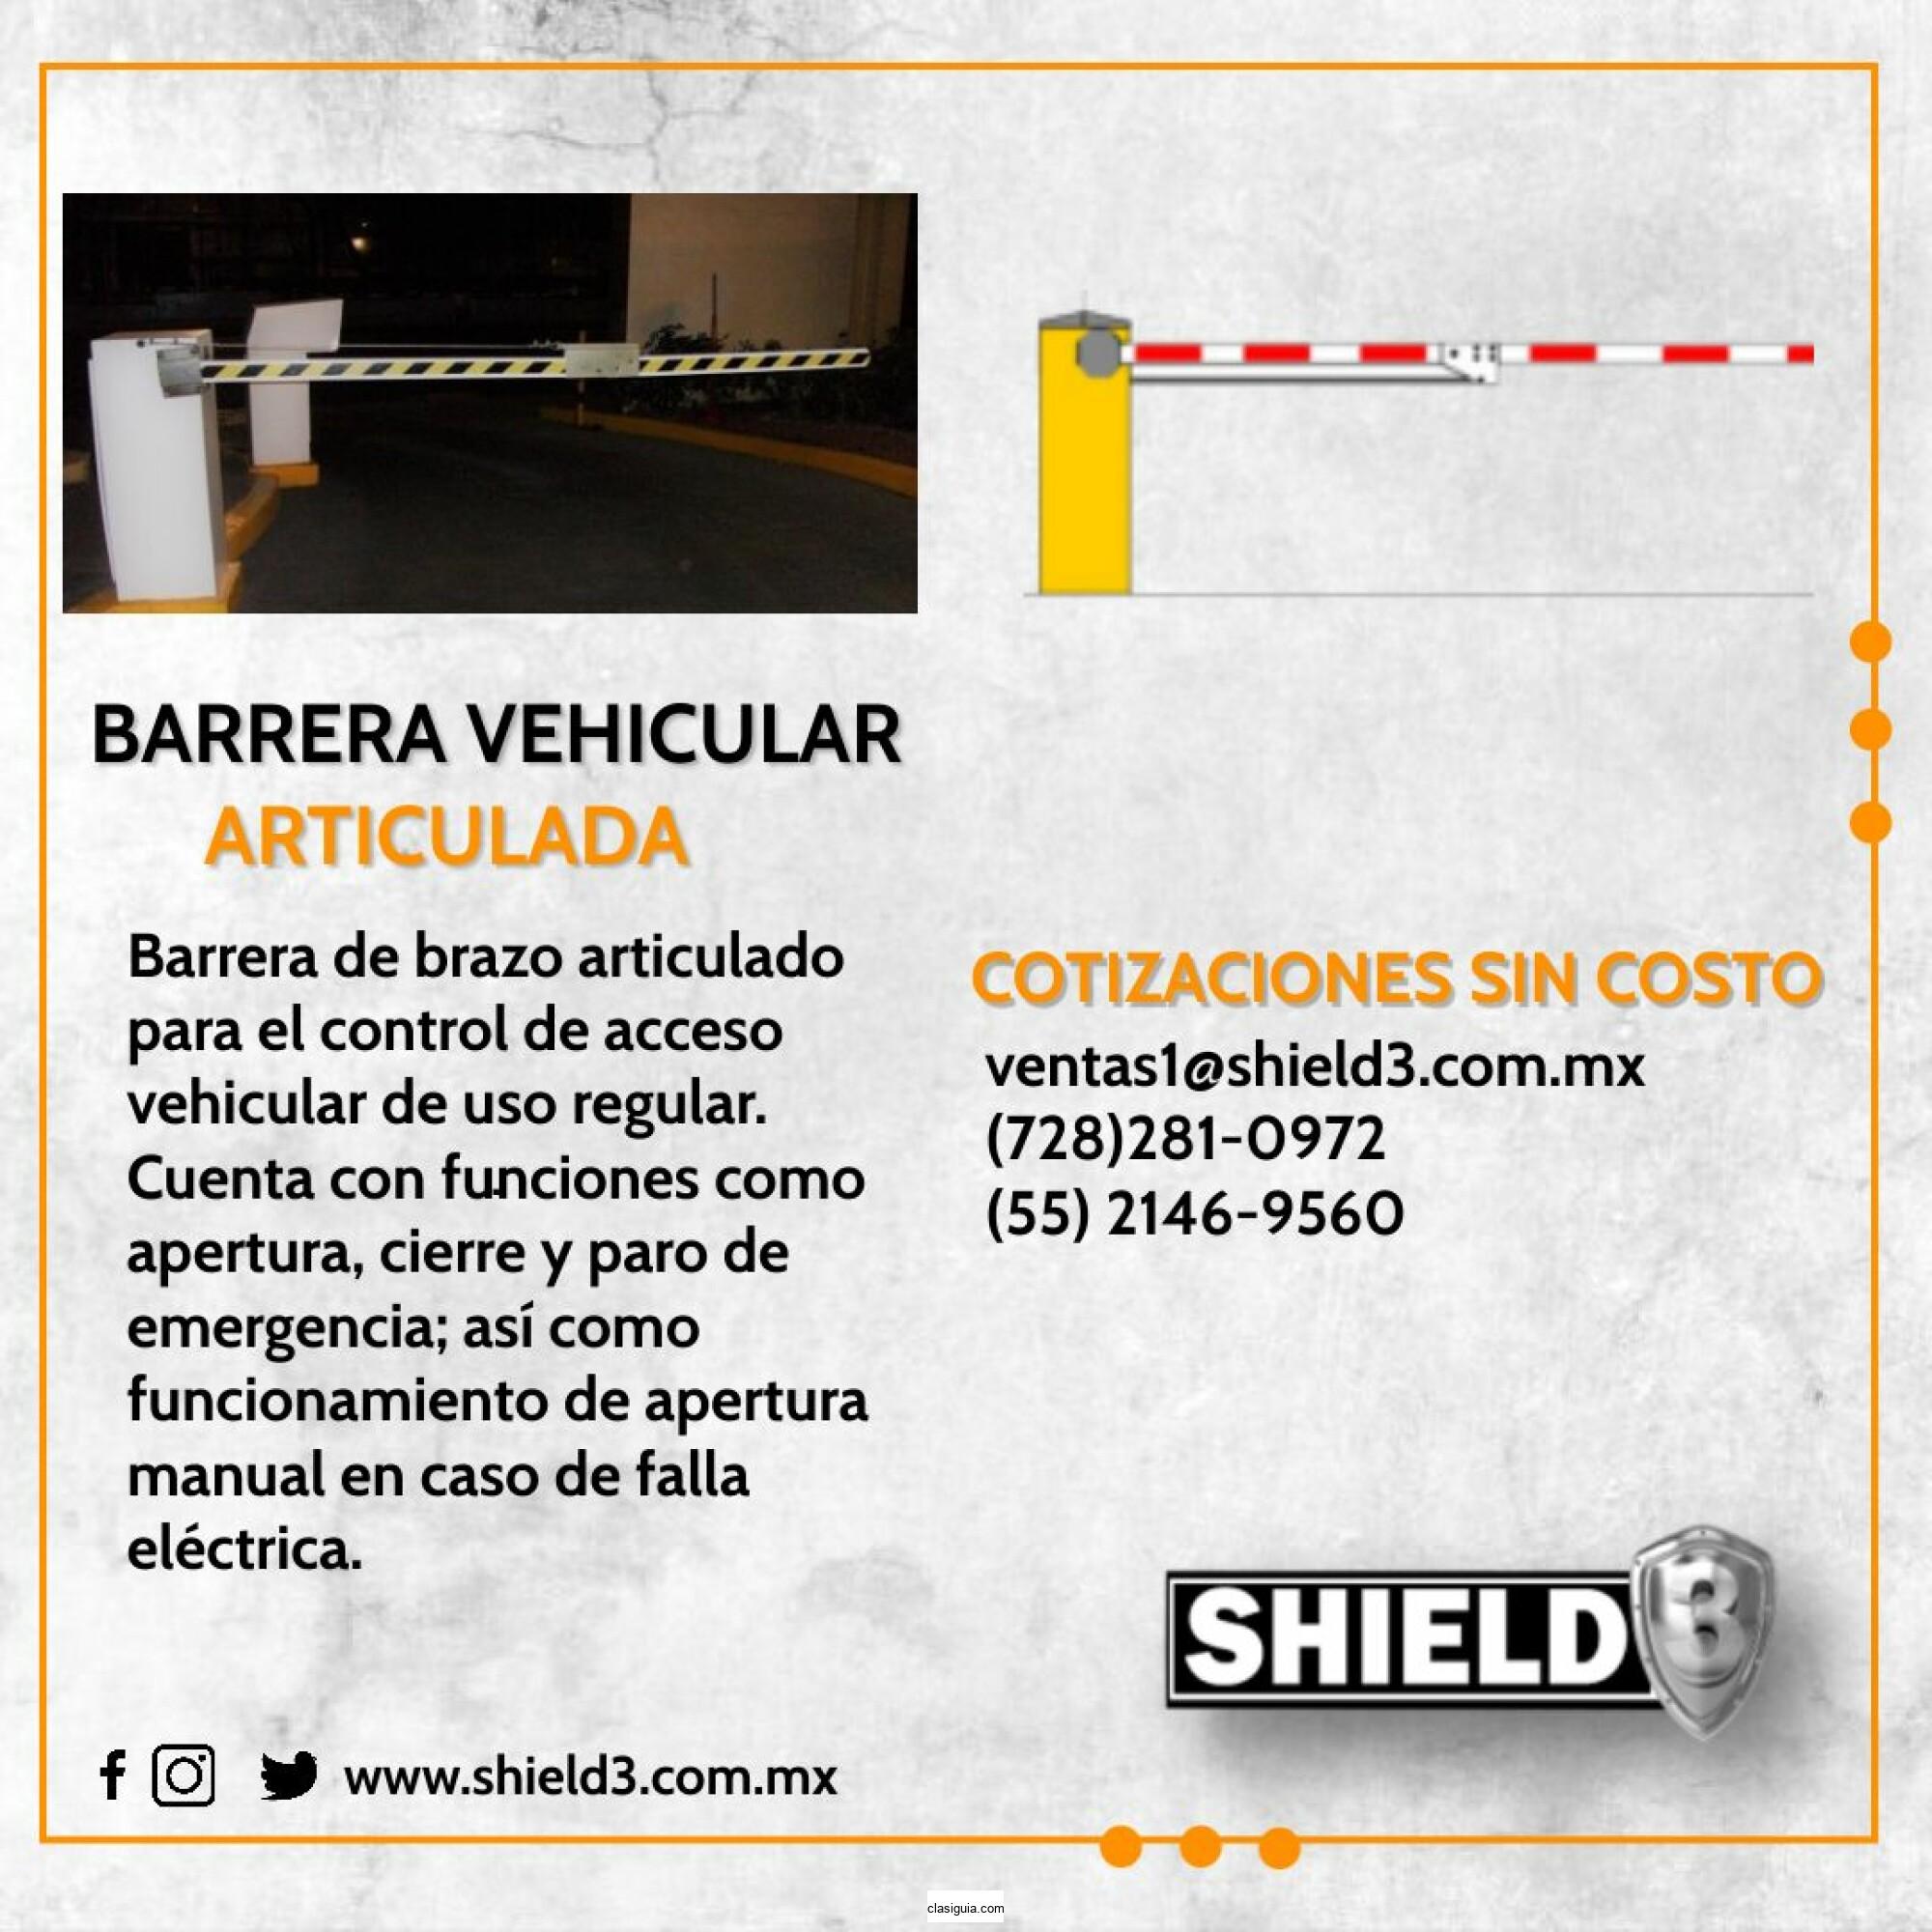 Barrera vehicular